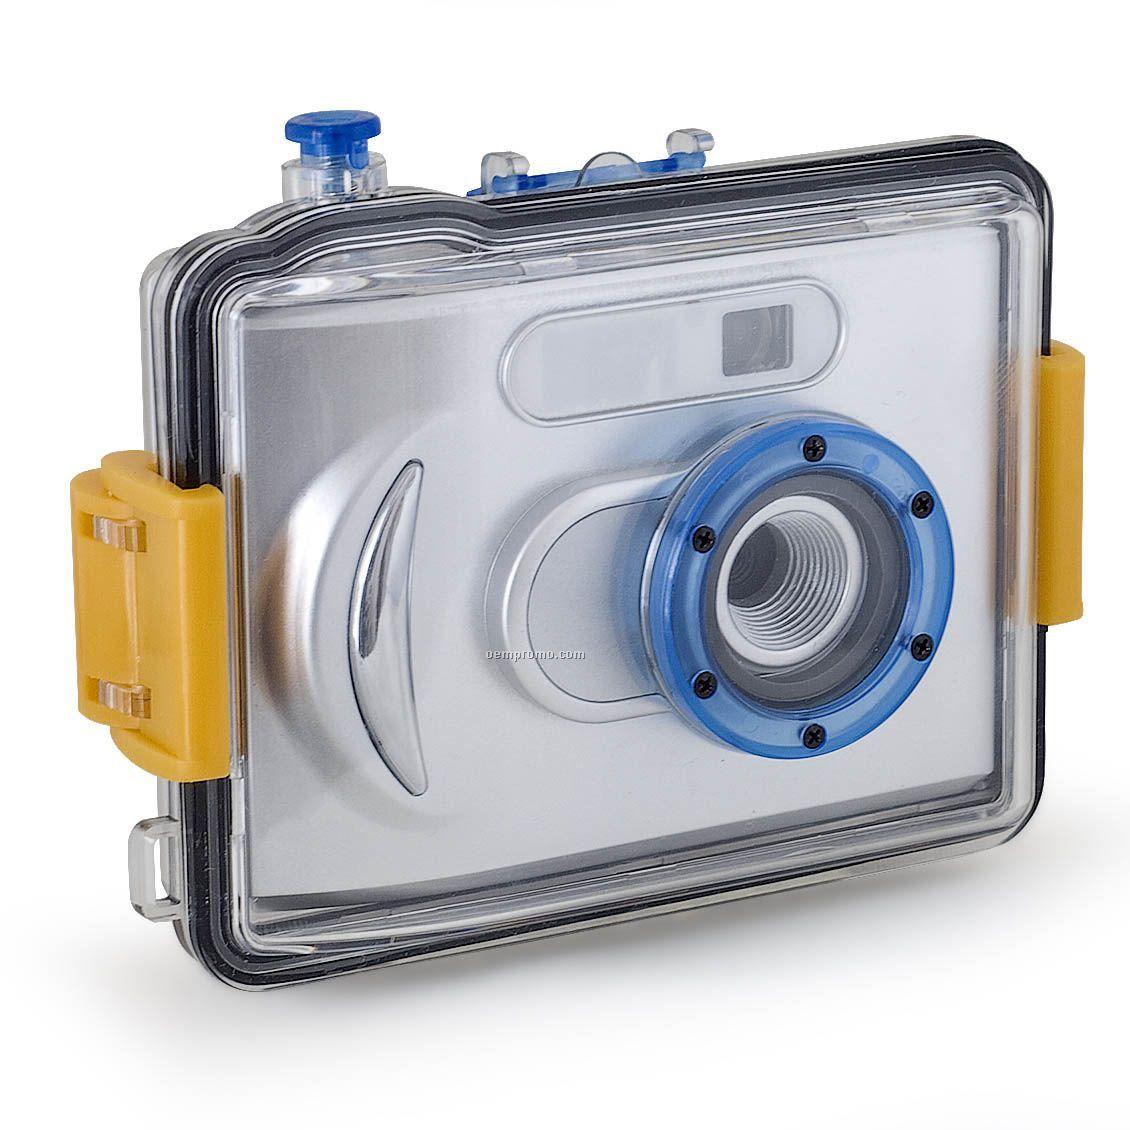 Cobra Digital 3-in-1 Digital Camera & Under Water Case